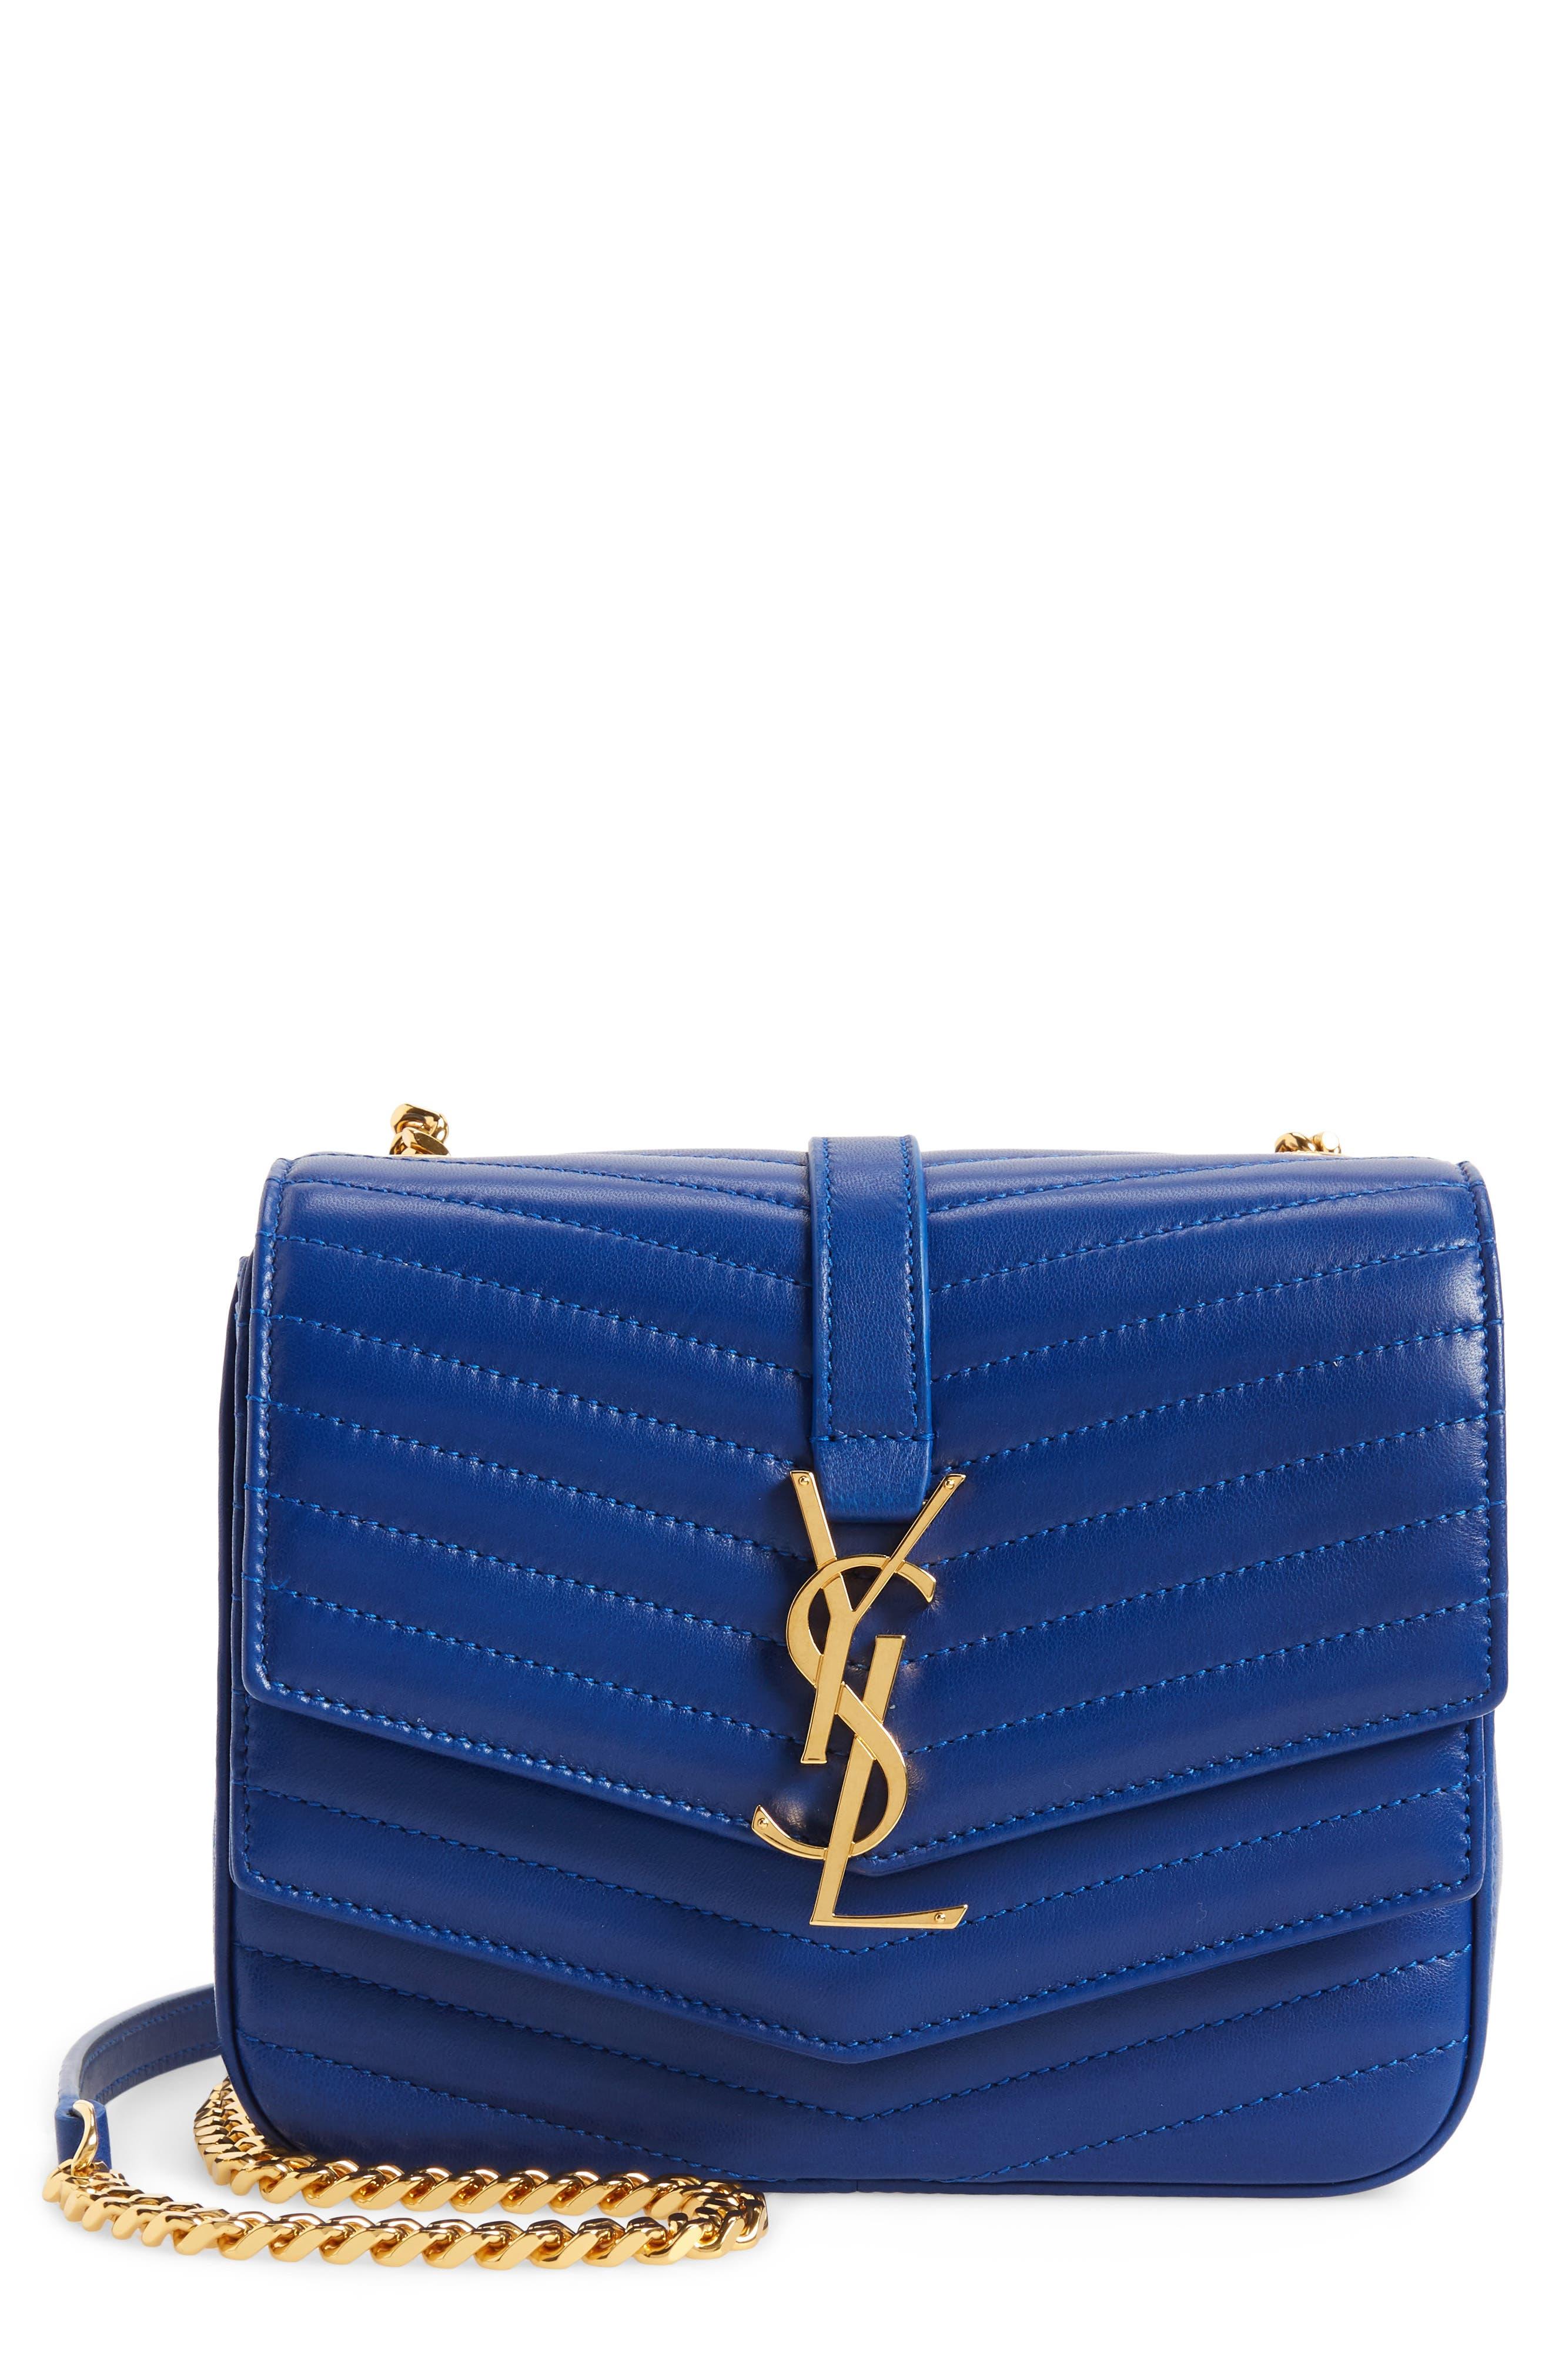 SAINT LAURENT Montaigne Quilted Lambskin Crossbody Bag, Main, color, 400